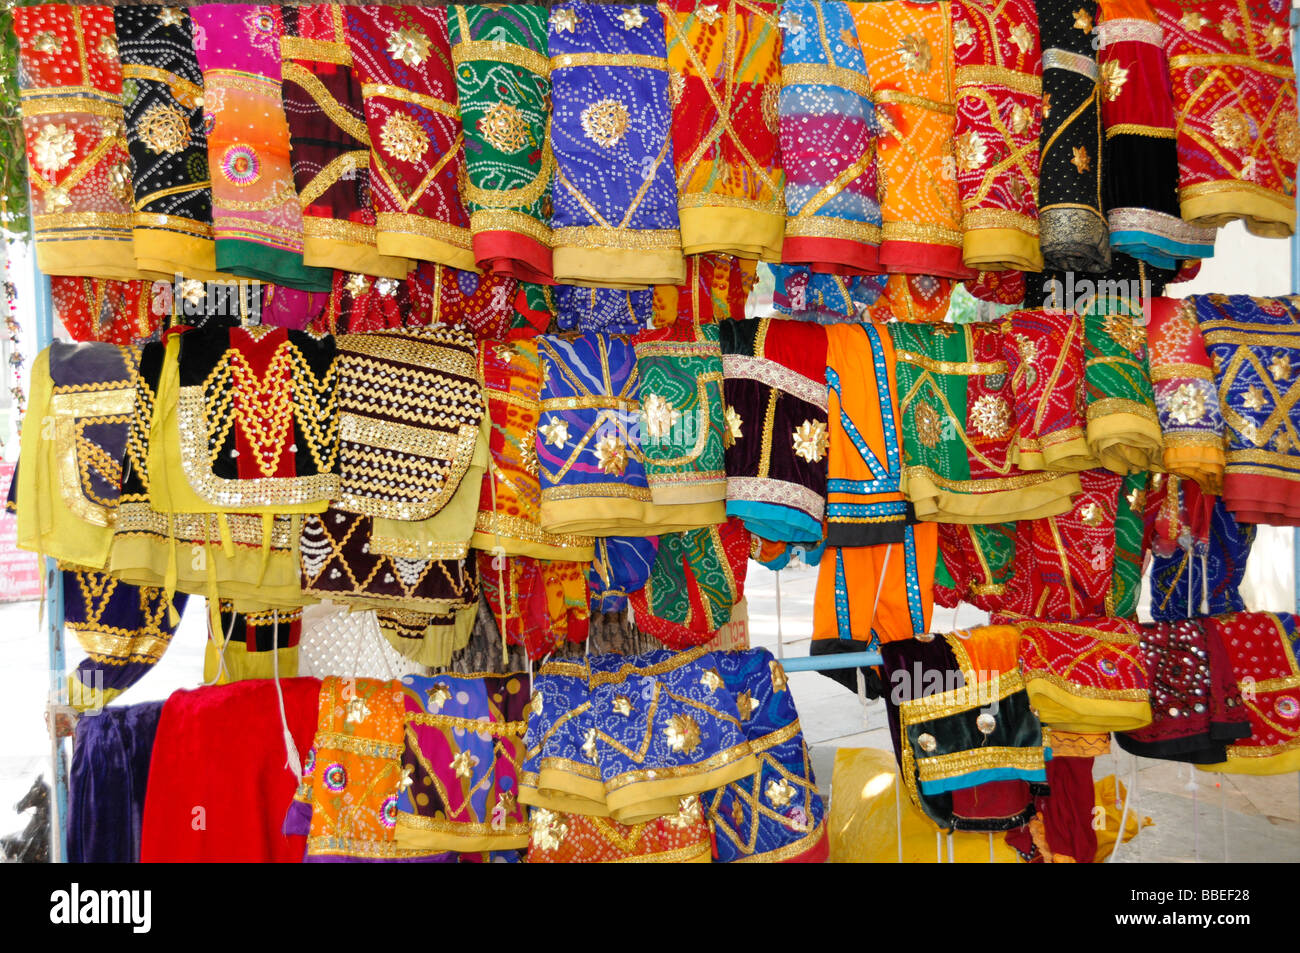 Handicrafts Souvenirs Udaipur Bazaar Rajasthan Northern India